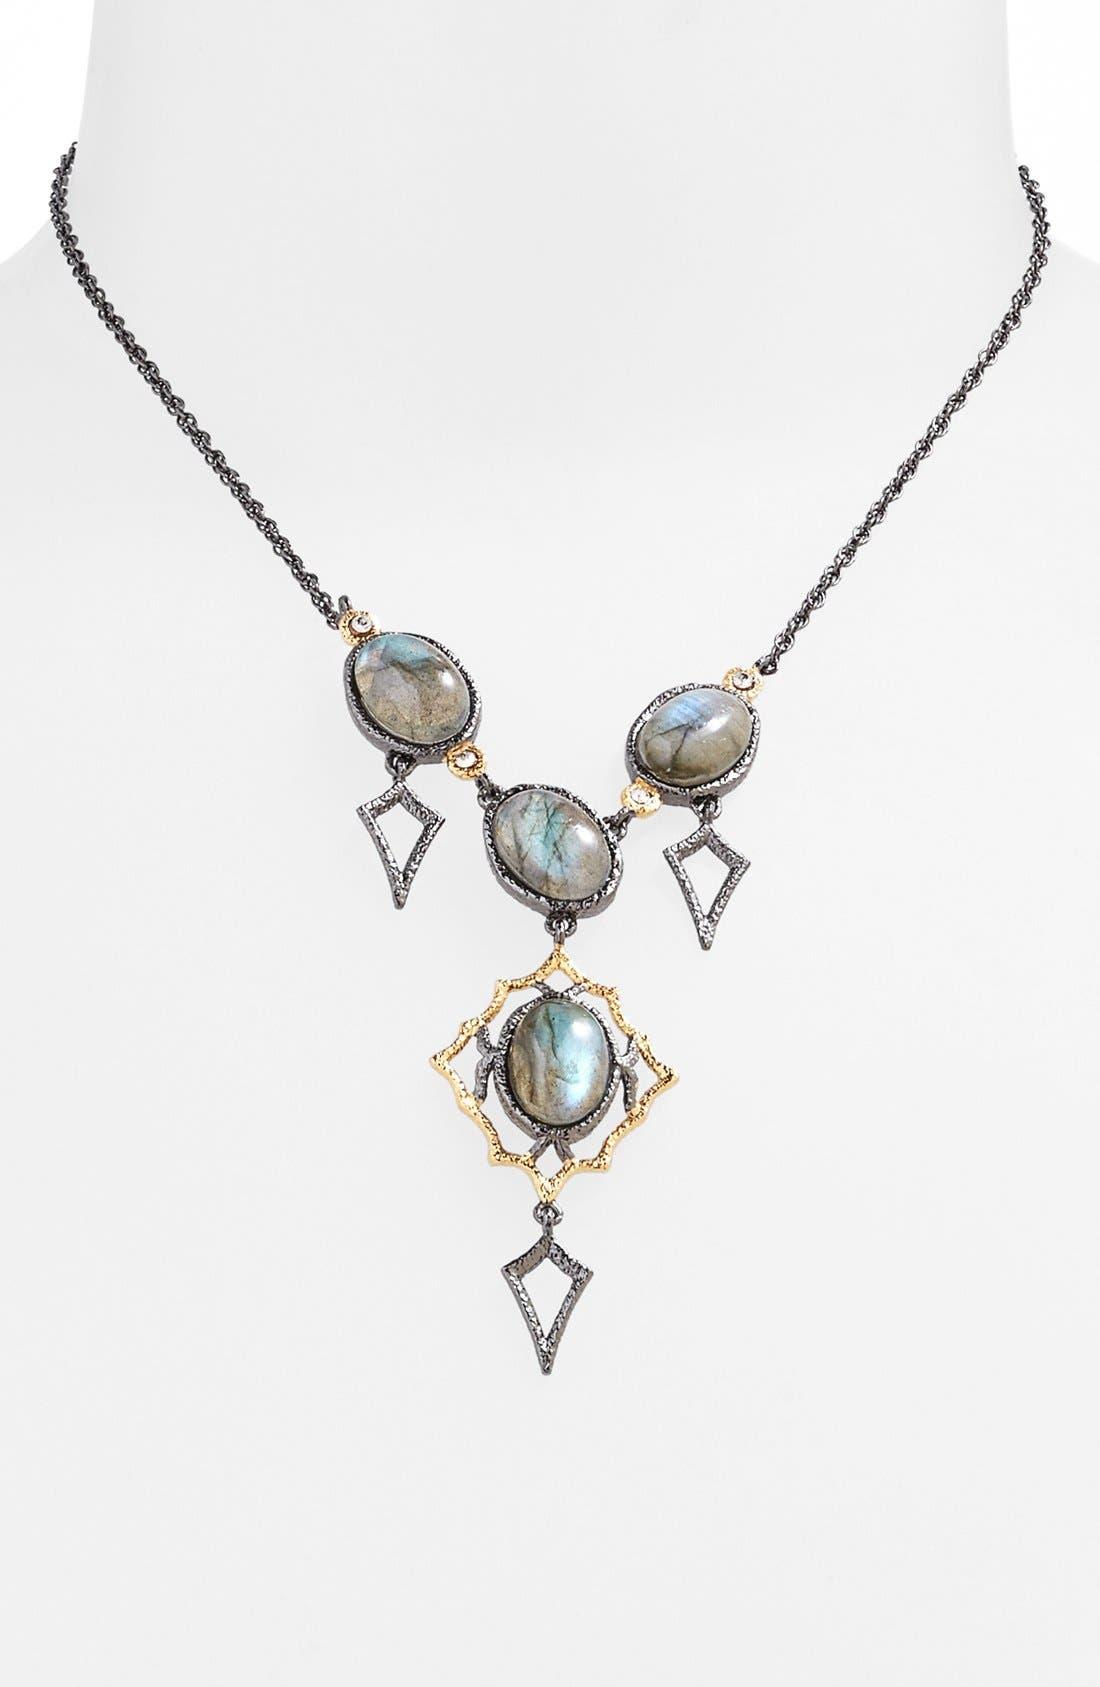 Alternate Image 1 Selected - Alexis Bittar 'Jardin de Papillon' Frontal Necklace